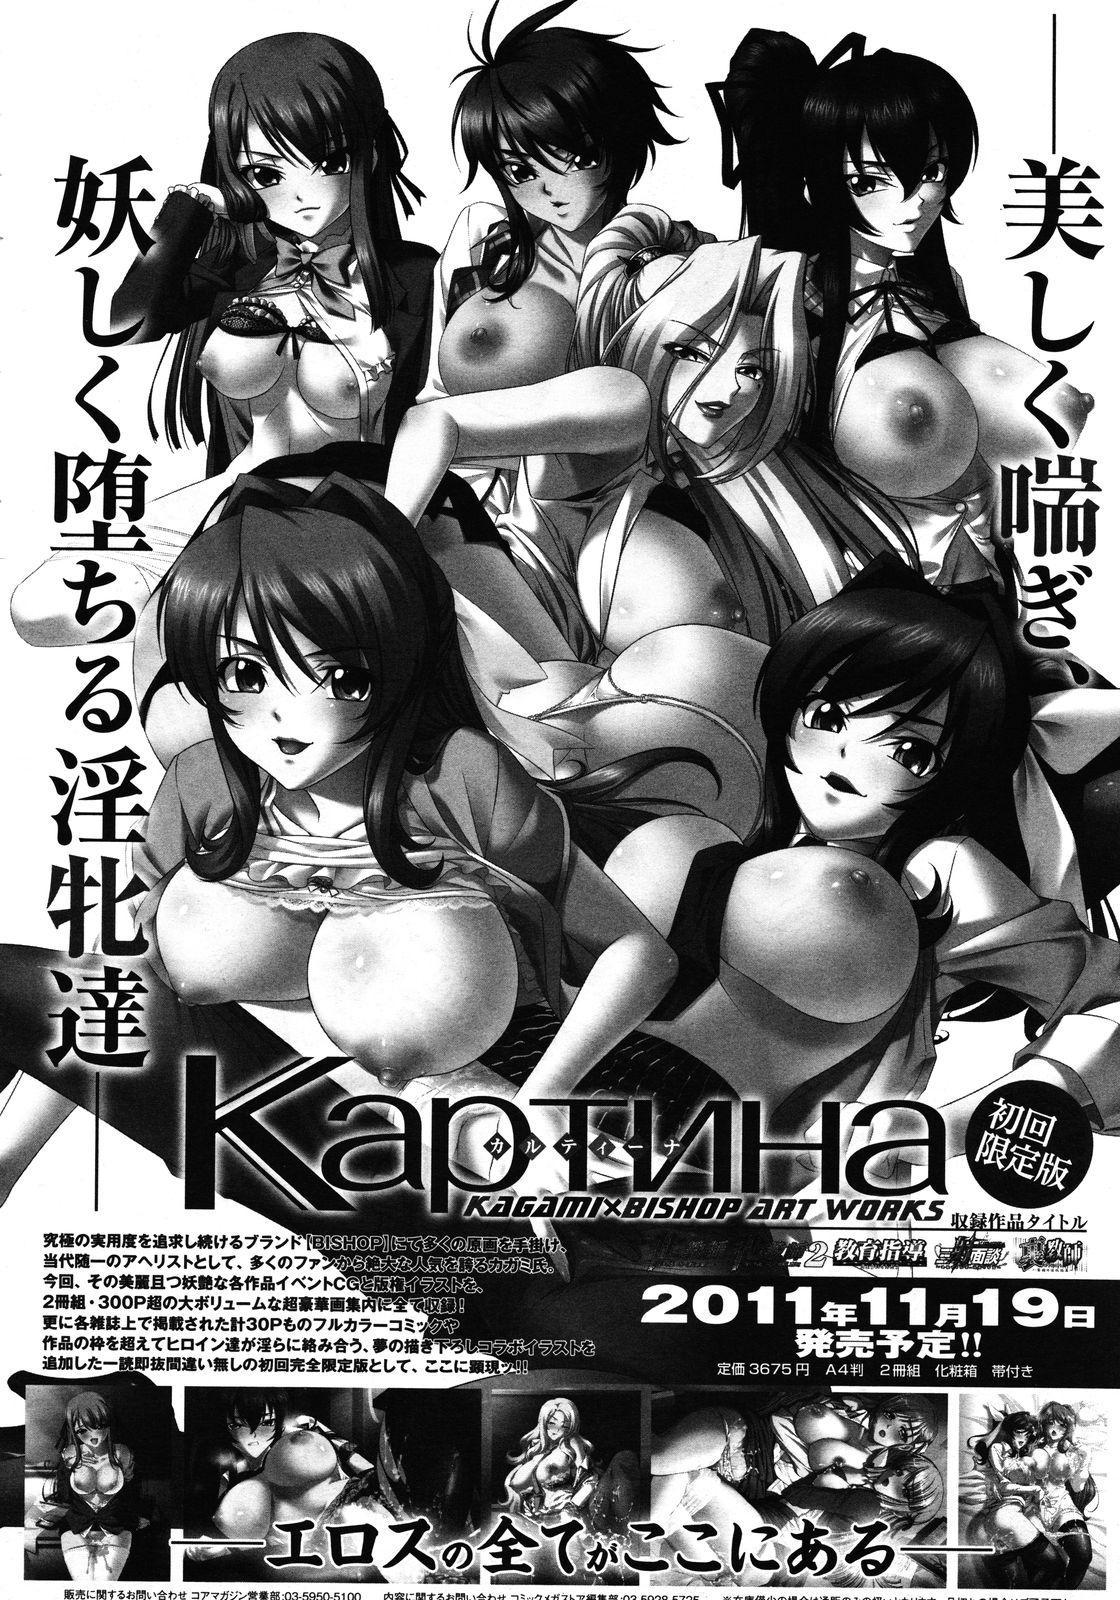 COMIC Megastore 2012-01 73